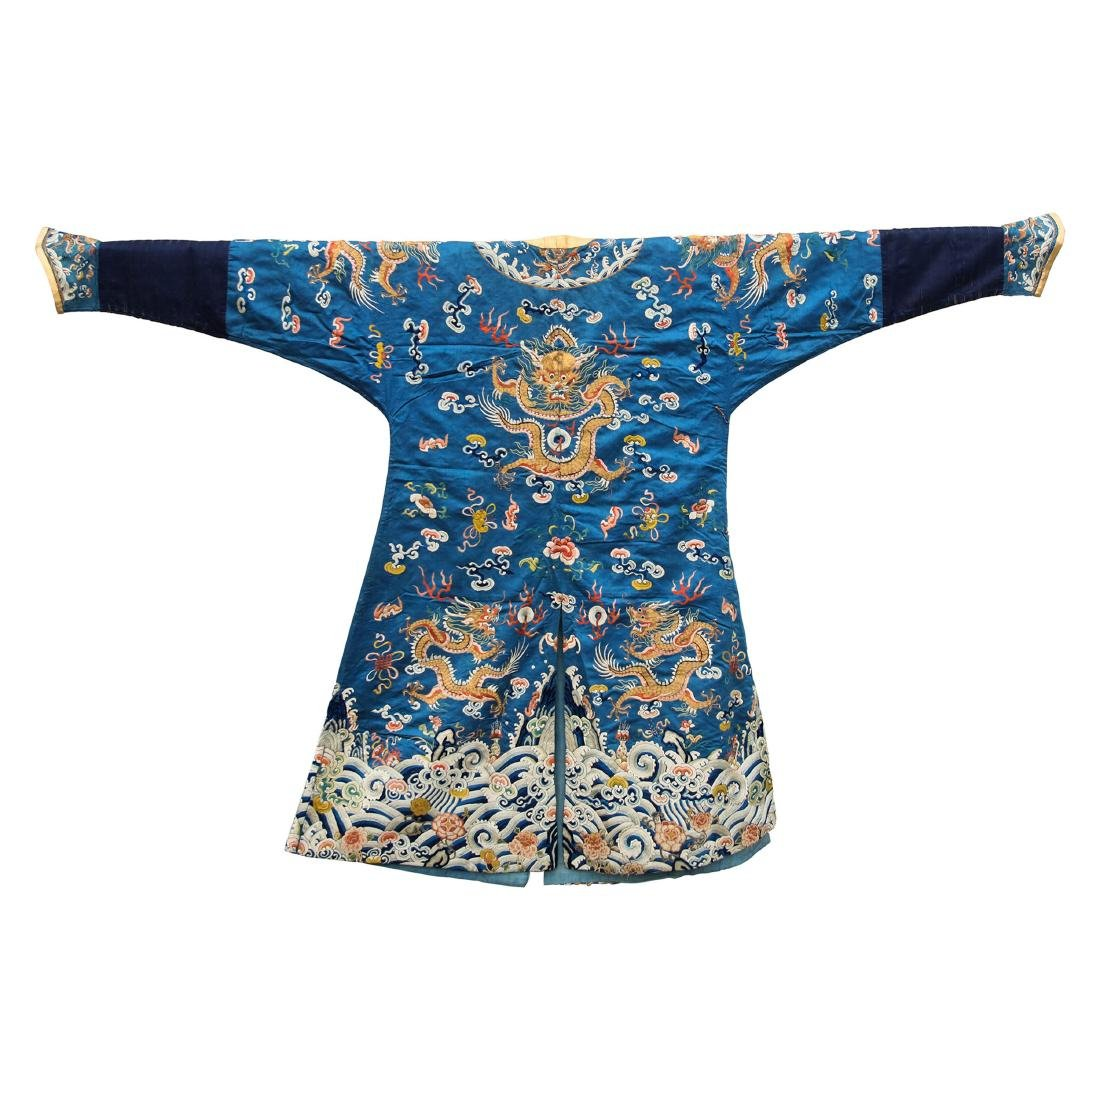 ca4ec9b312b6e CHINESE BLUE EMBROISE DRAGON IMPERIAL ROBE